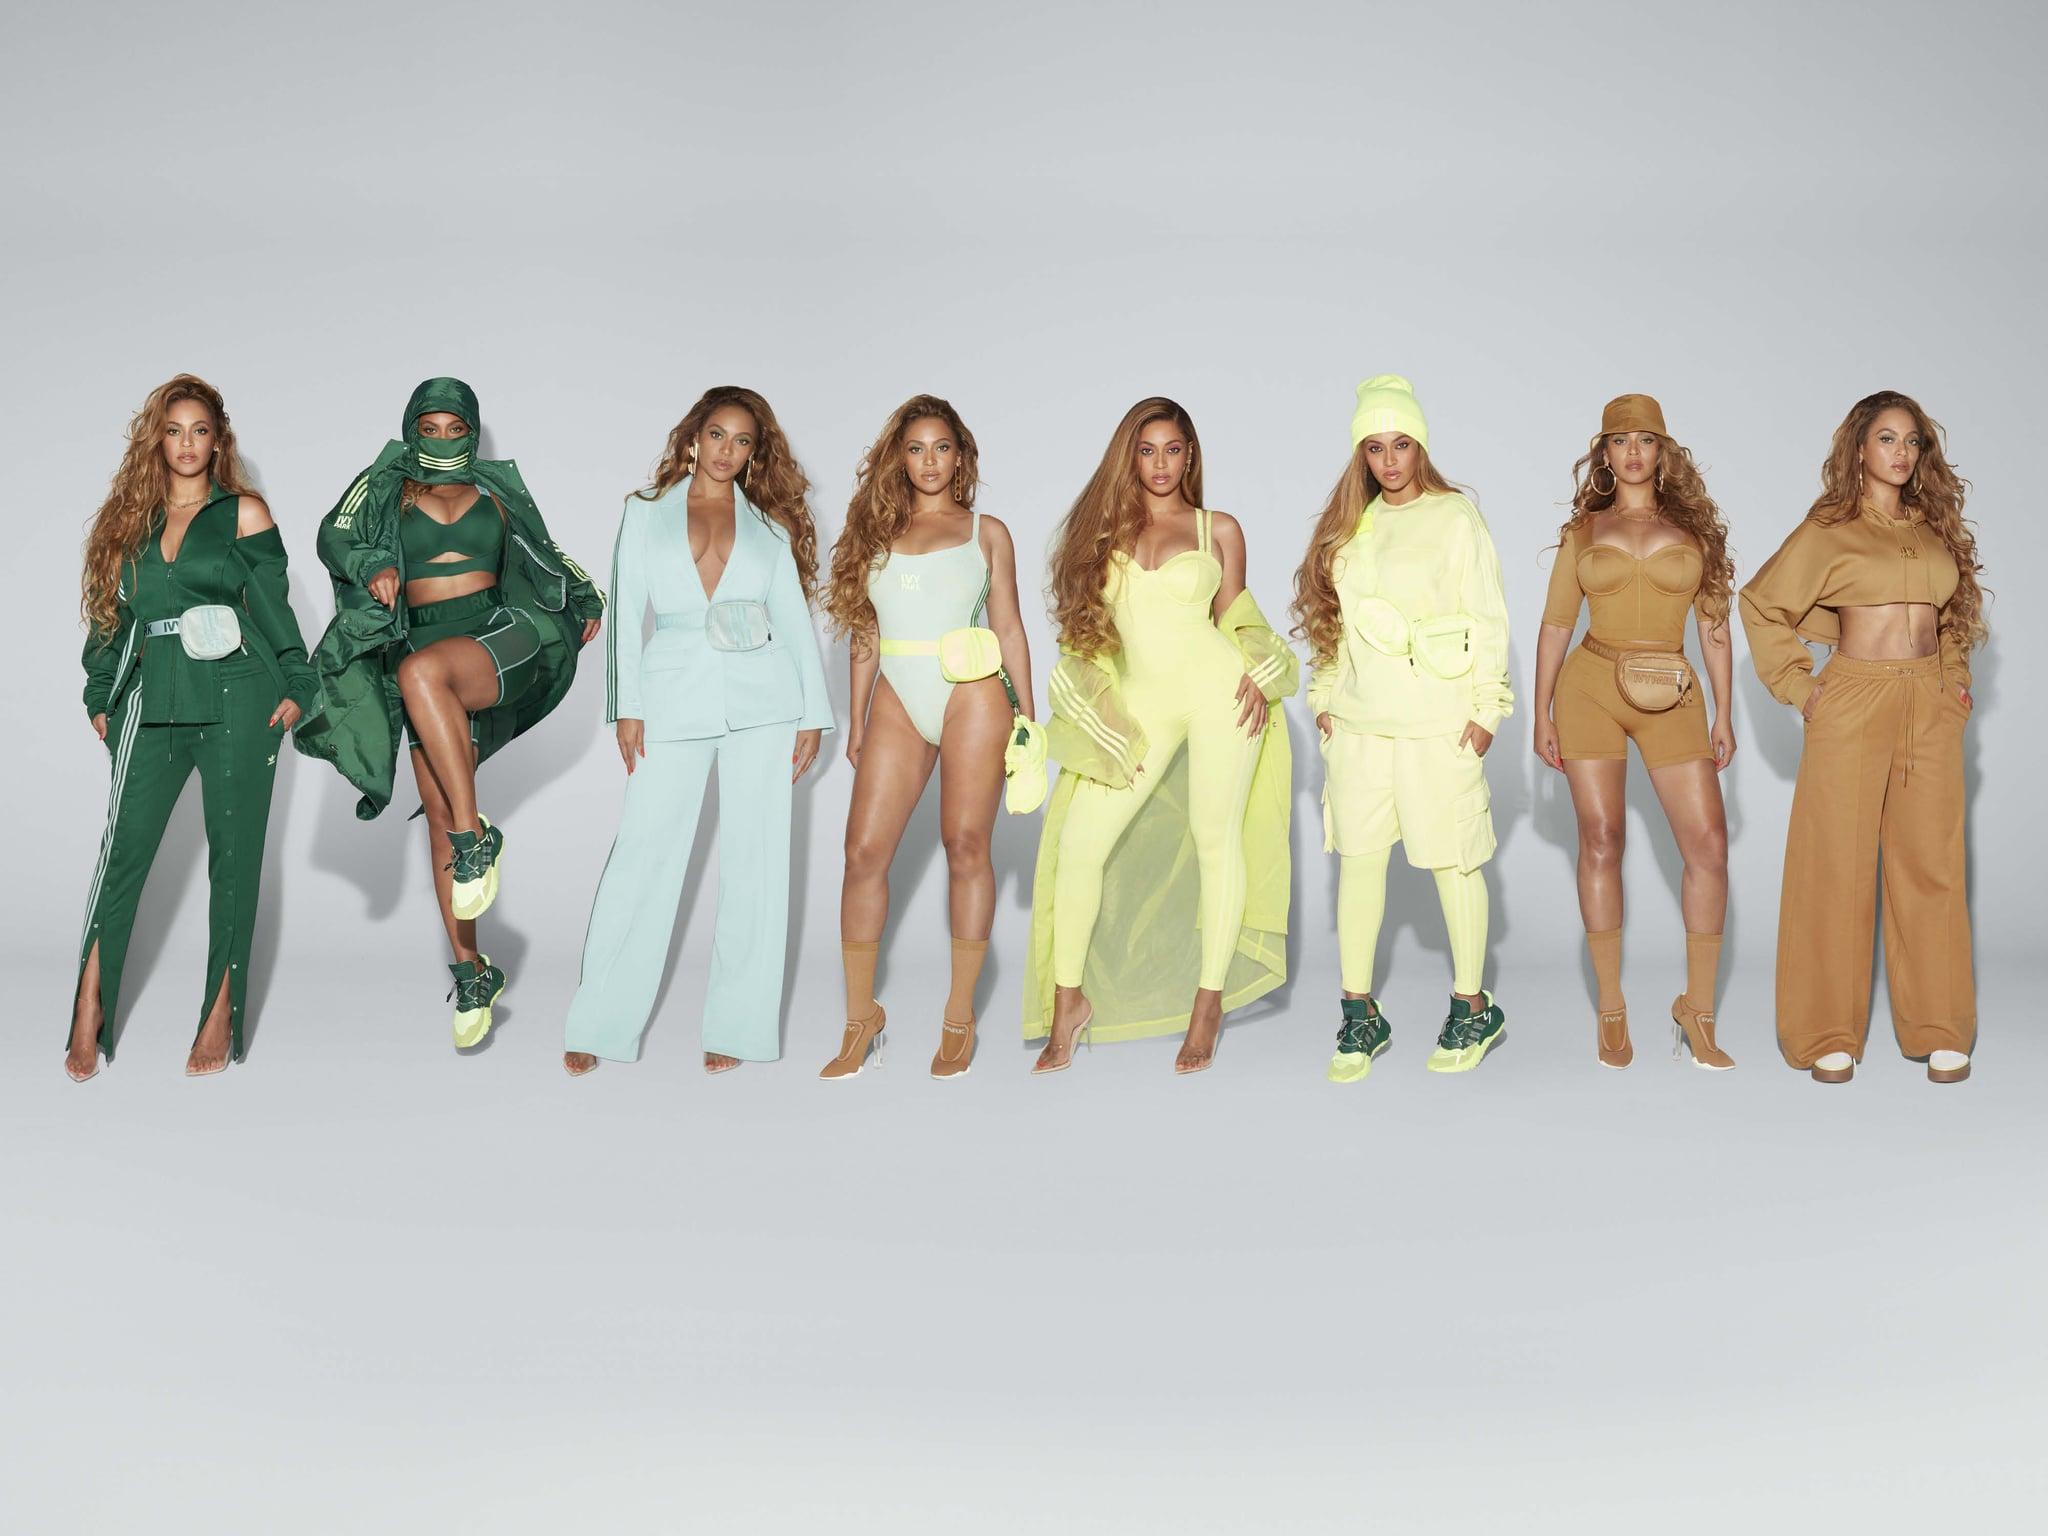 Beyoncé anuncia 'Drip 2' en colaboración con Adidas